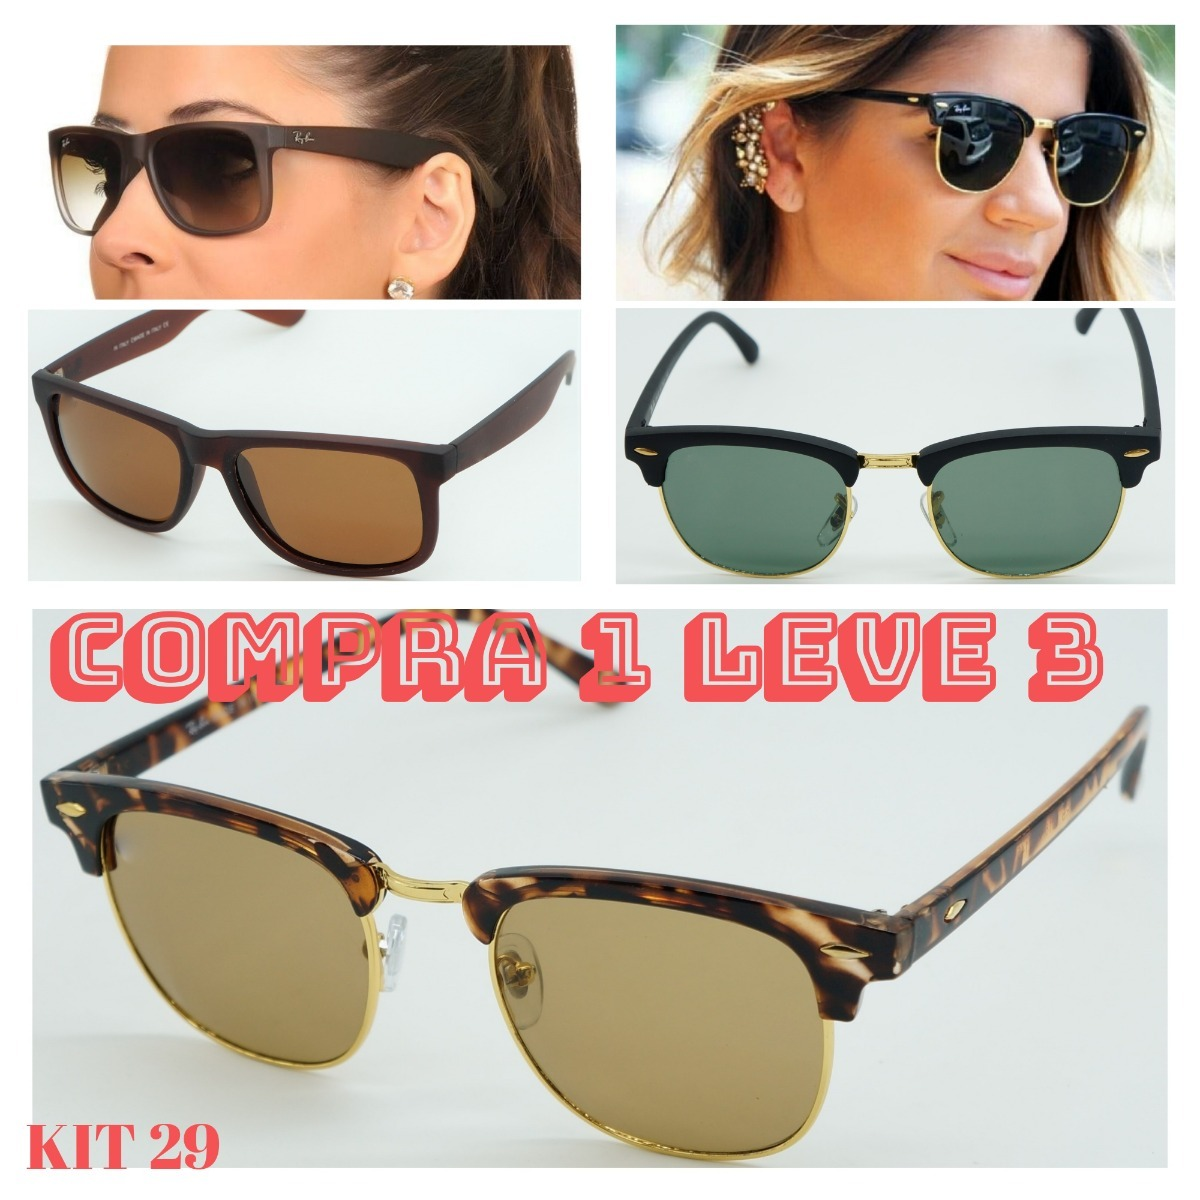 2736afad6 óculos de sol aviador erica erika marrom tartaruga feminino. Carregando  zoom.